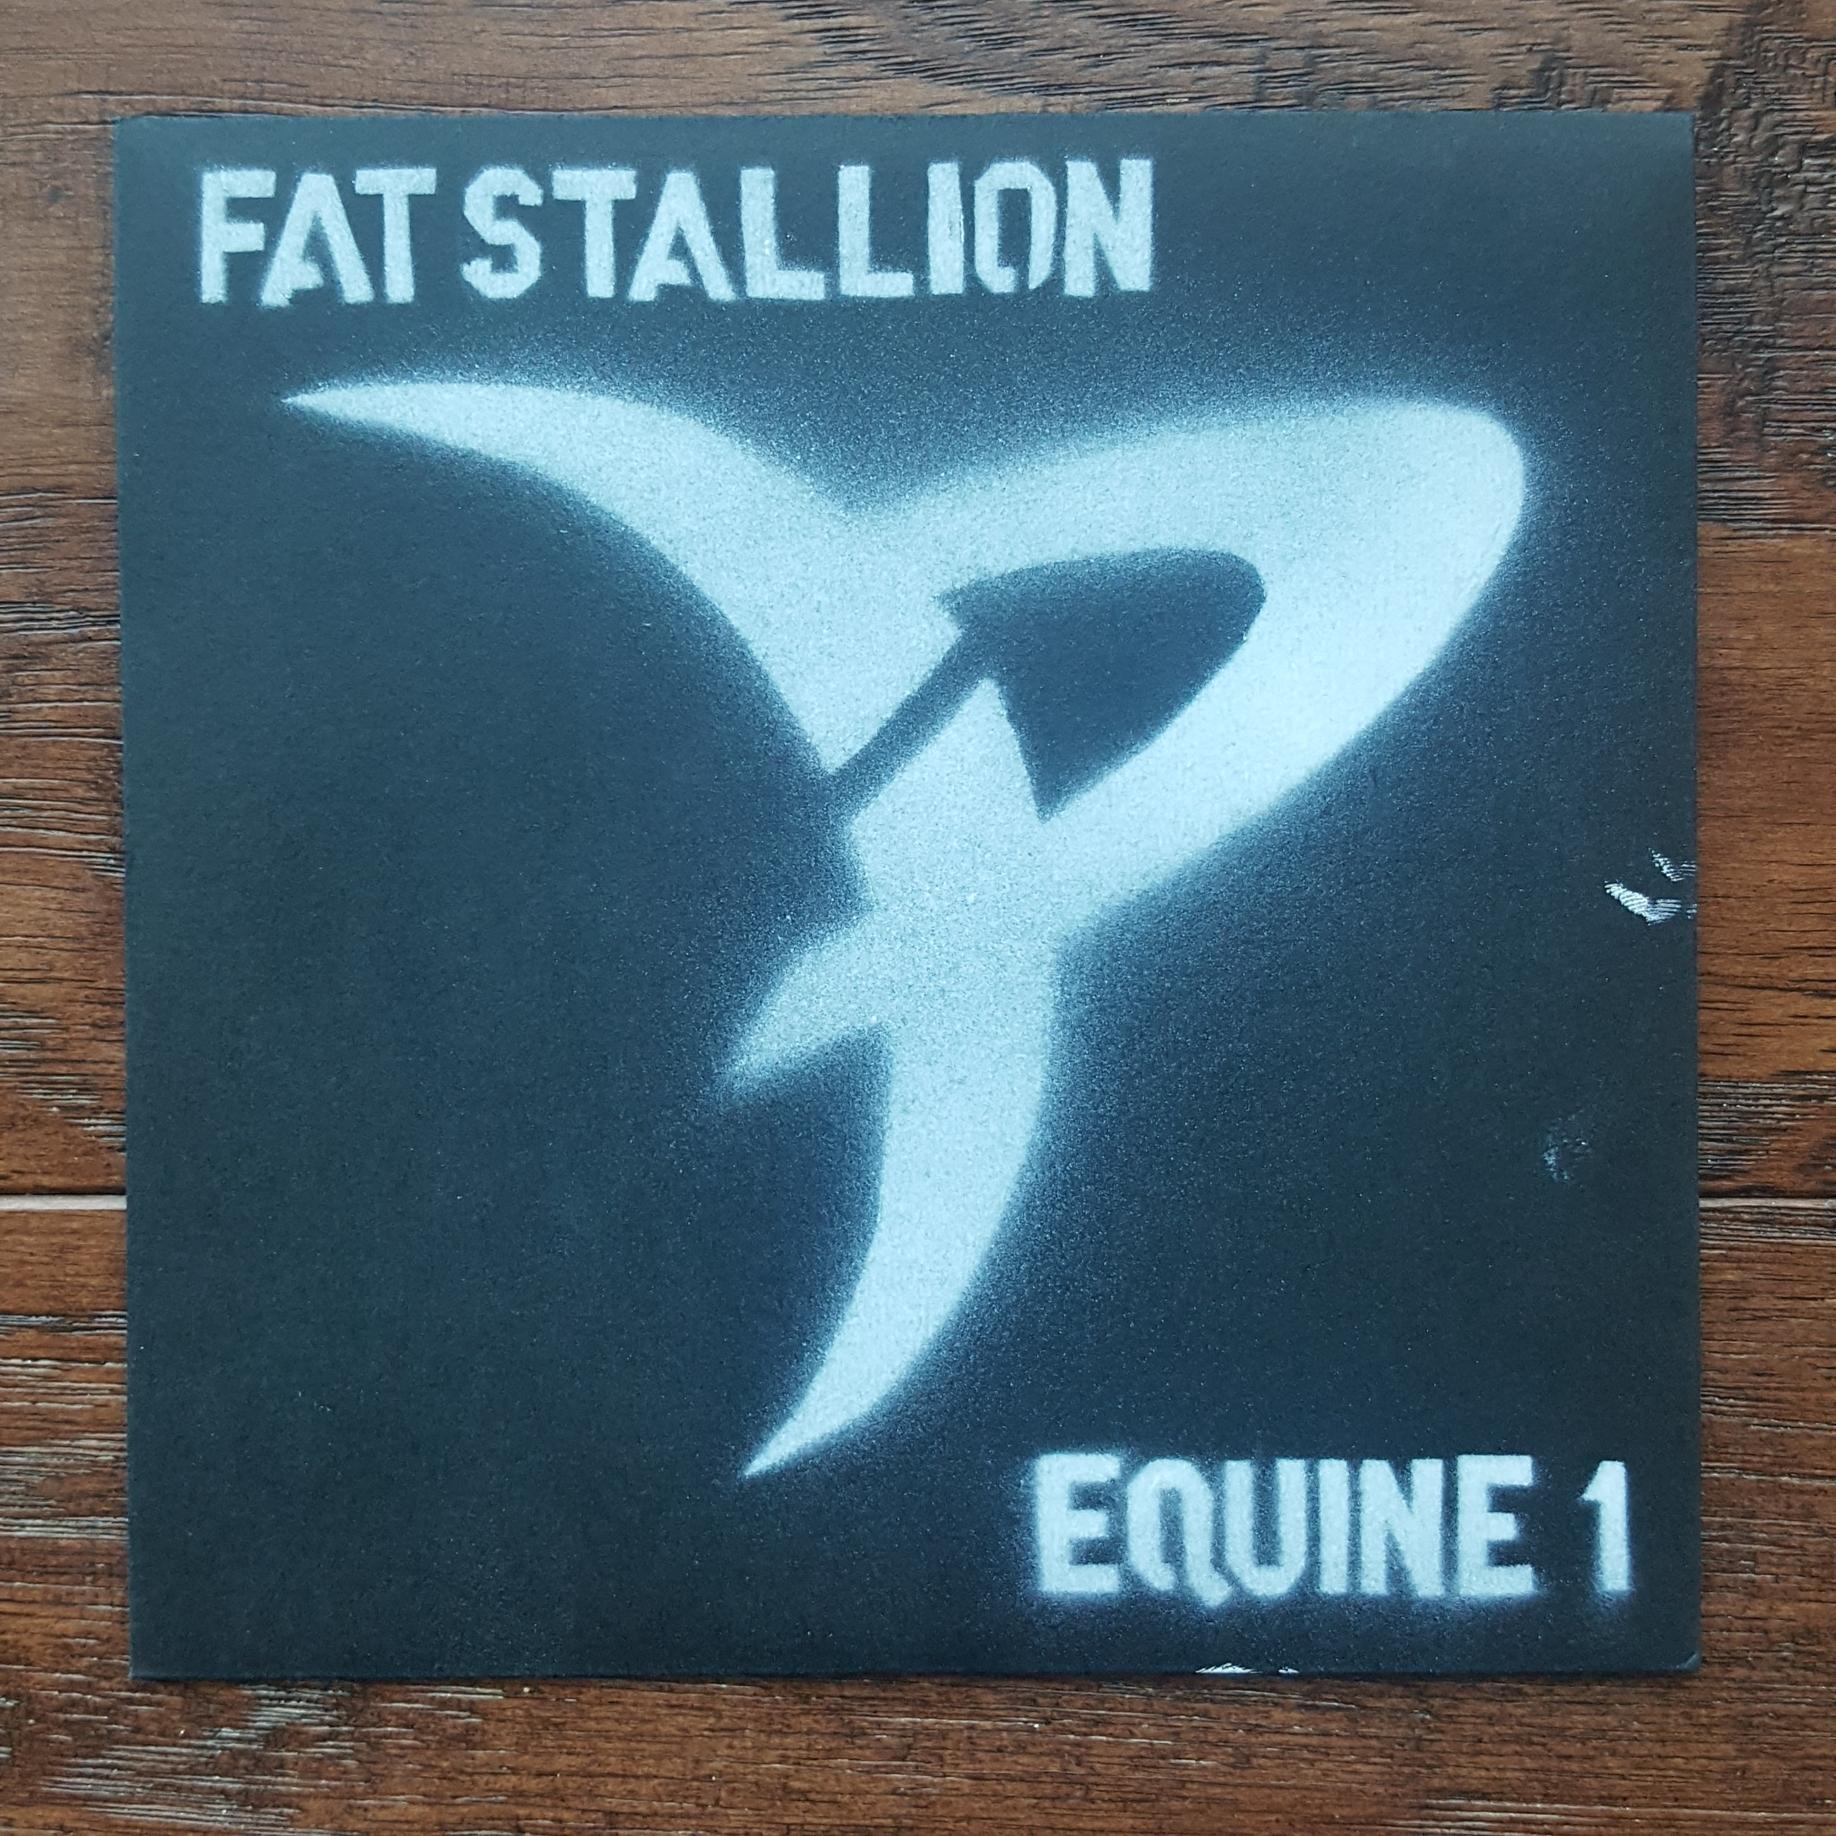 Equine 1